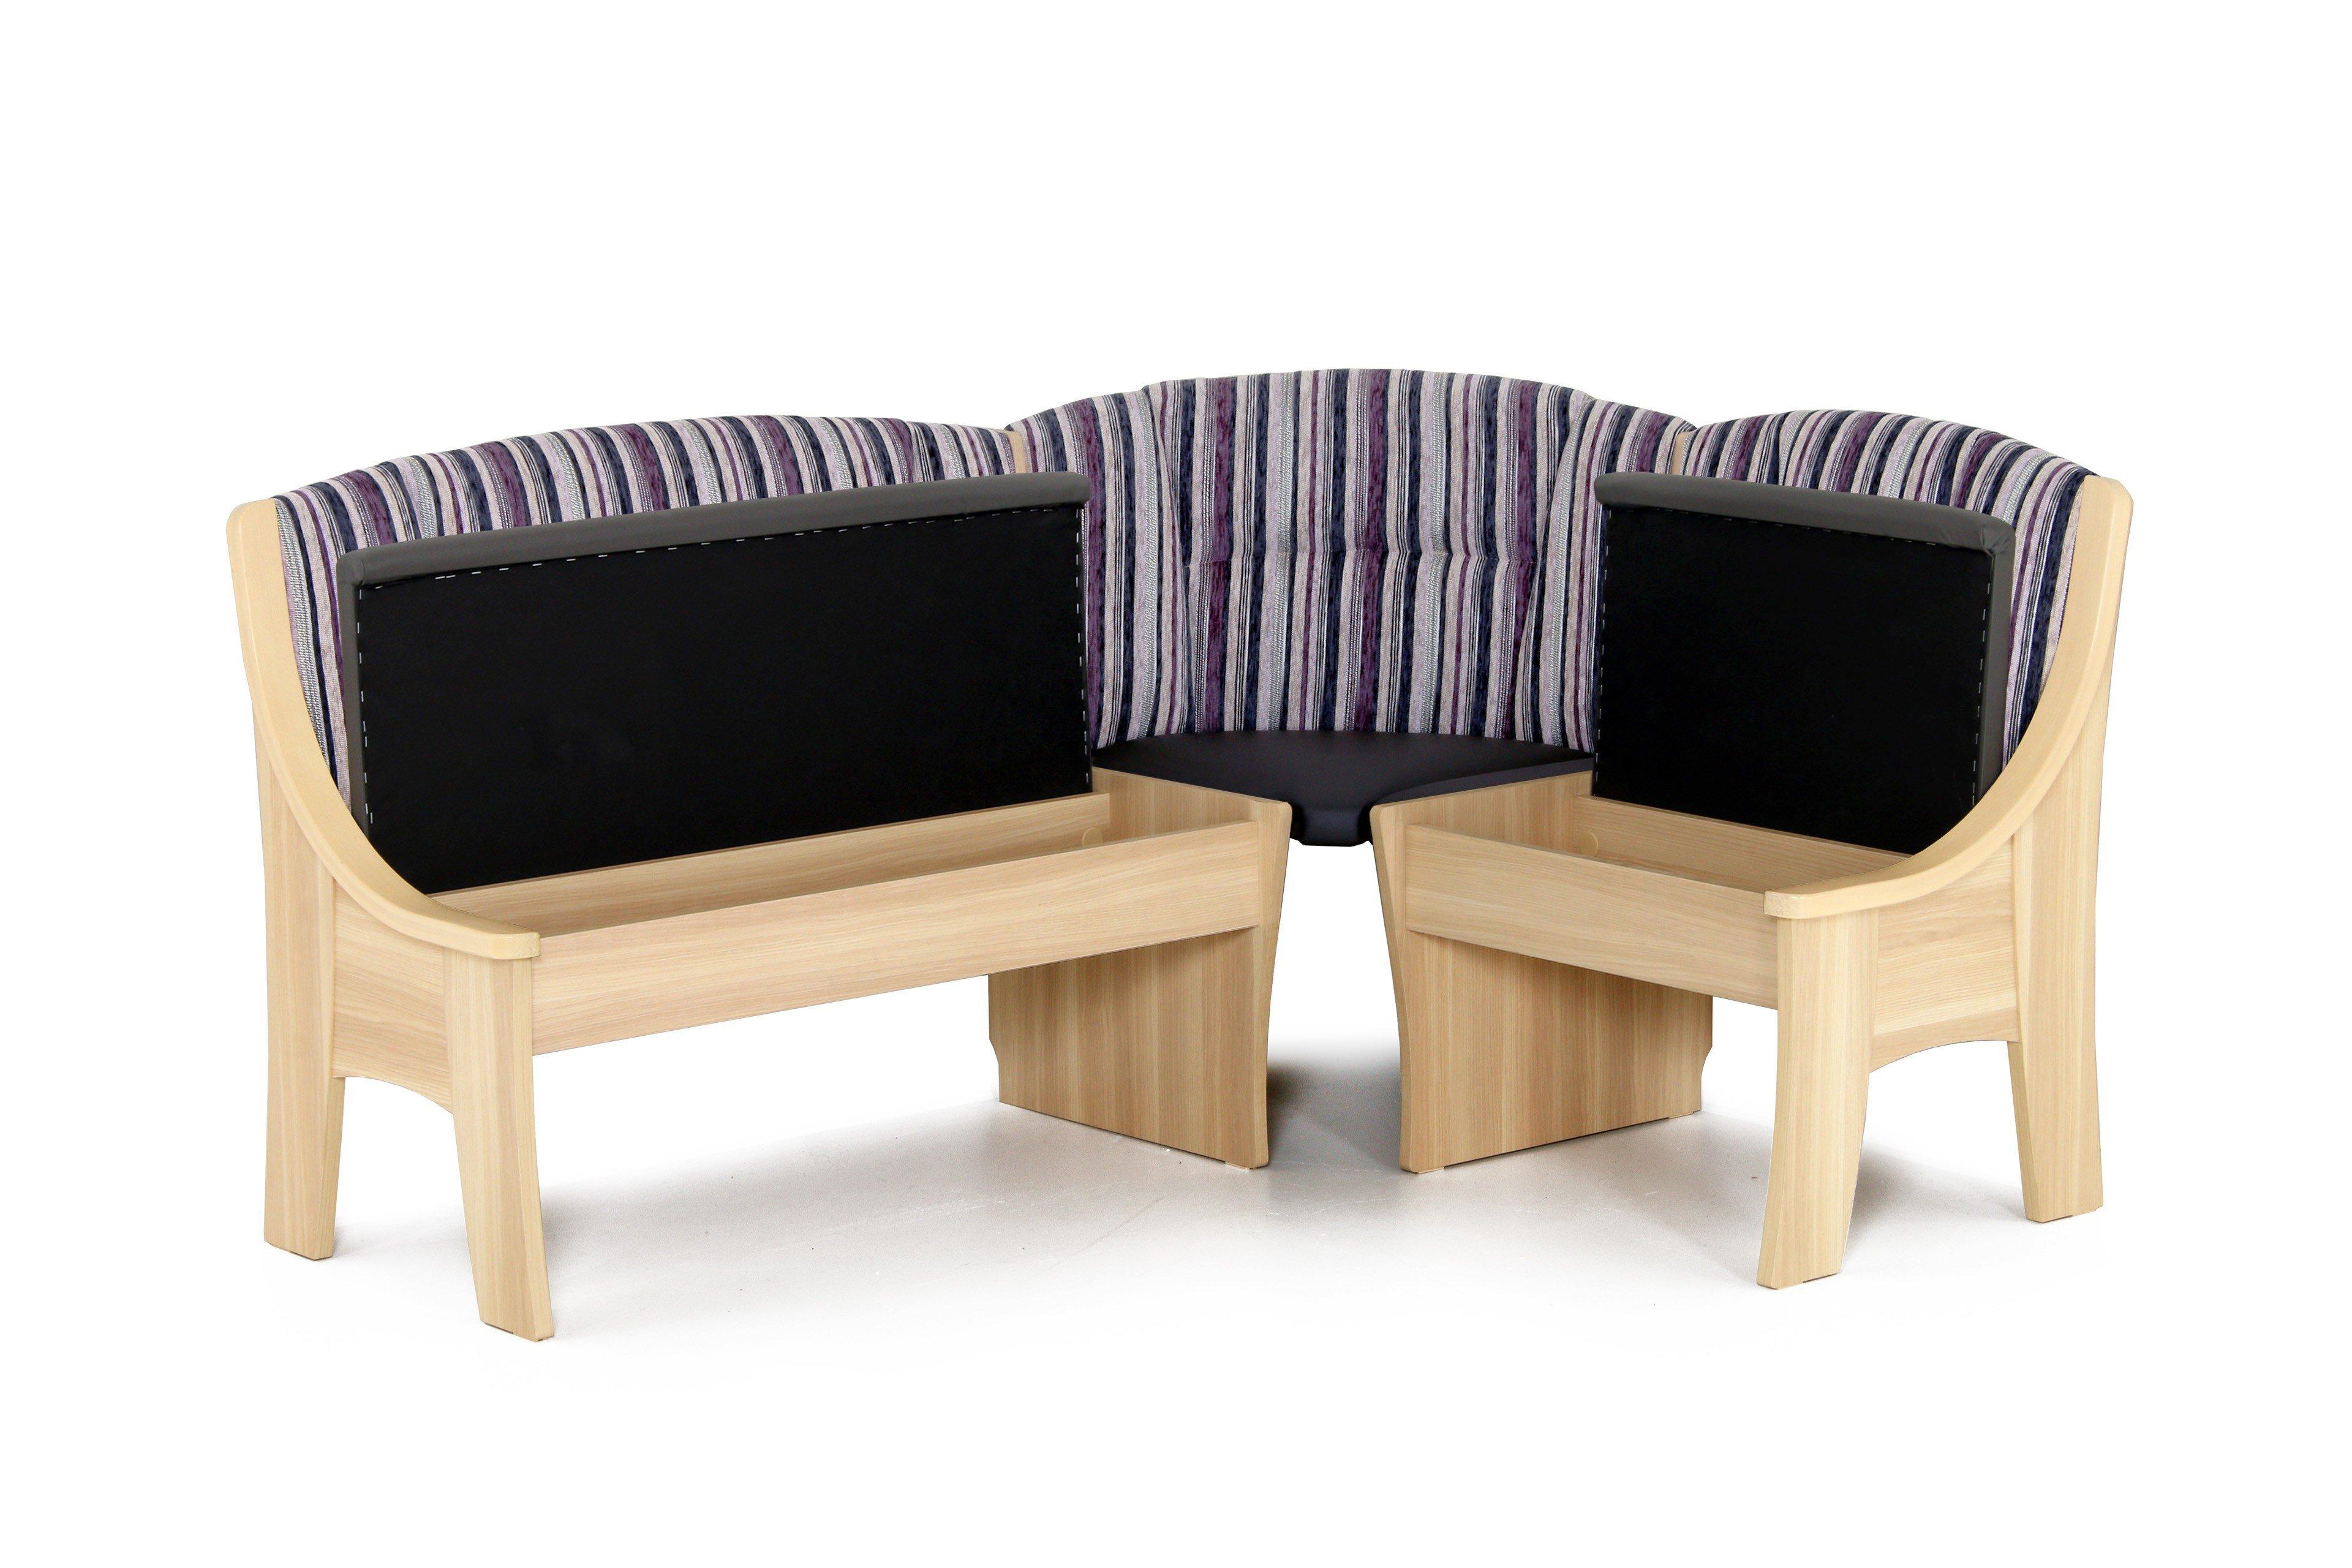 sch sswender eckbank gruppe iktus dortmund kernesche. Black Bedroom Furniture Sets. Home Design Ideas